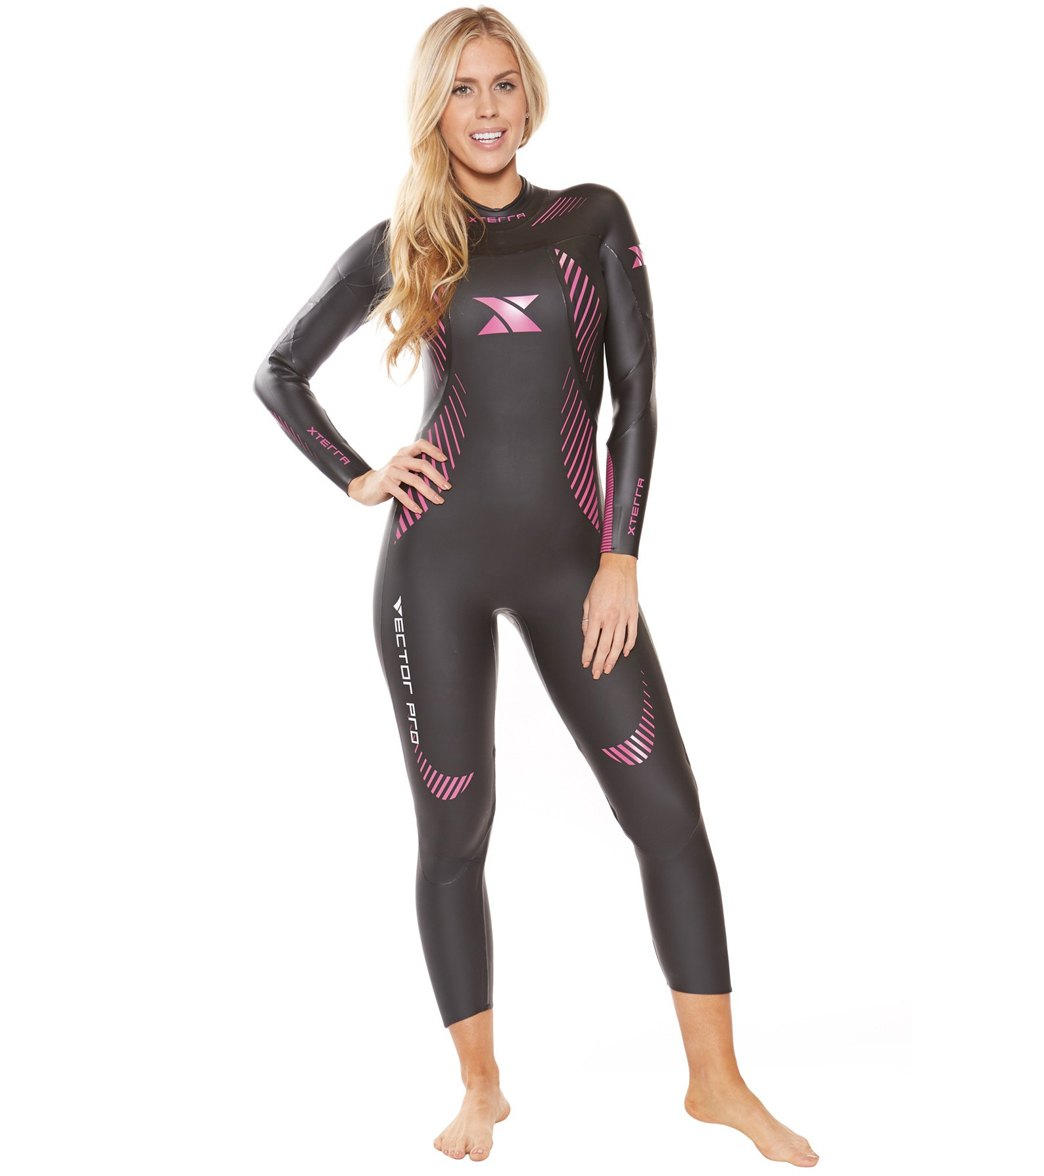 20c2e5866a Xterra Wetsuits Women s Vector Pro Fullsleeve Triathlon Wetsuit